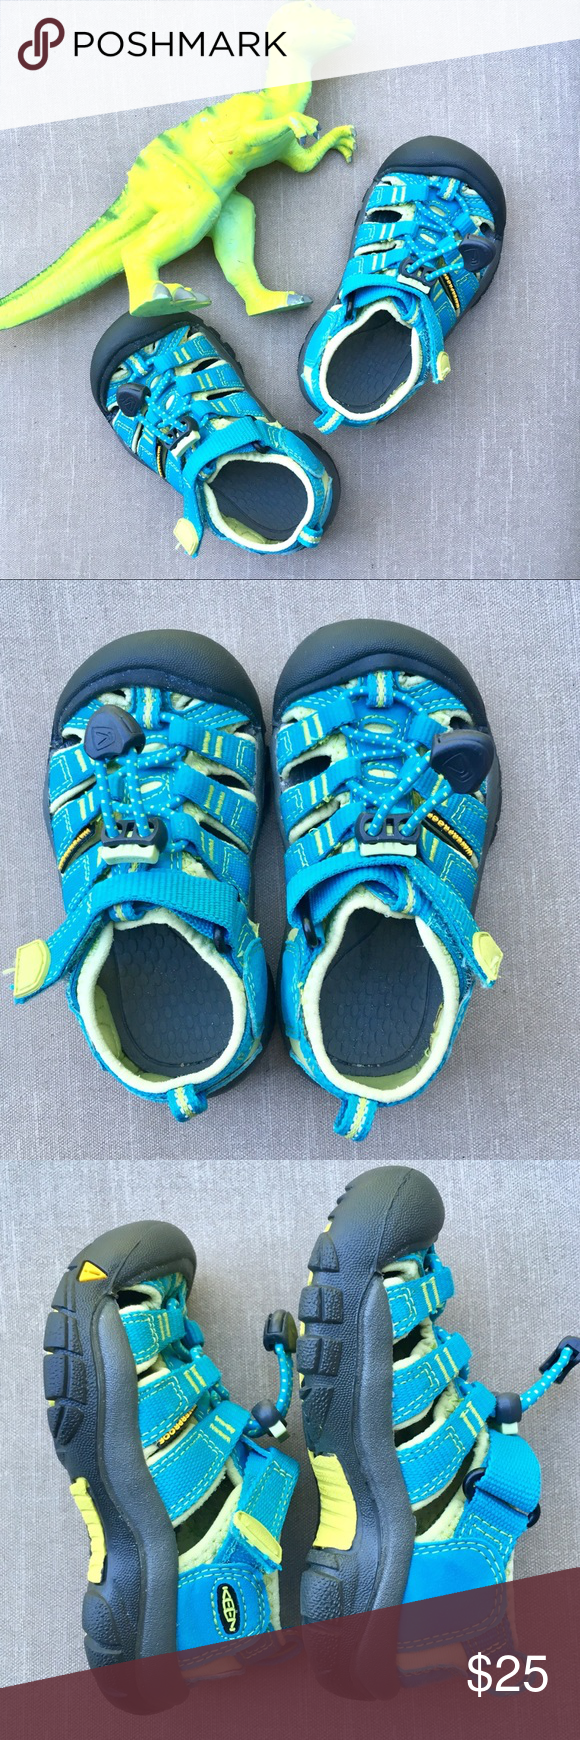 8bd56488fff6 Keen Newport H2 Sandals 8 Toddler Keen Newport H2 Sandals Waterproof Gently  used Blue and neon